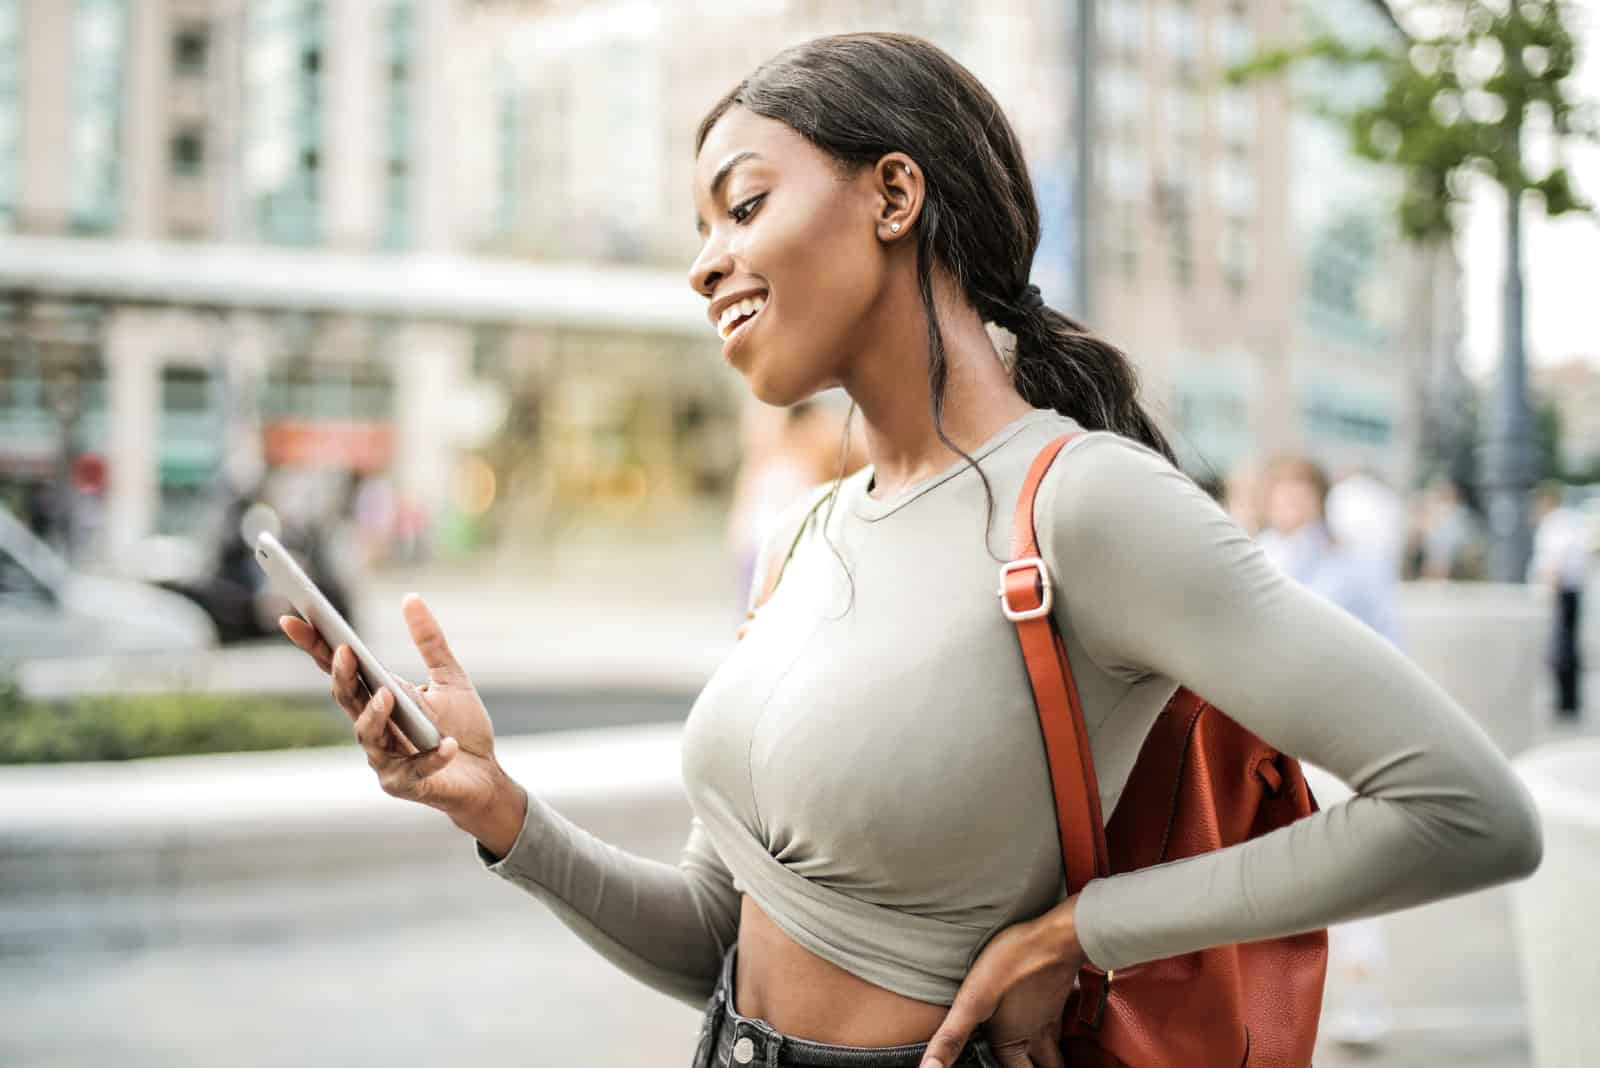 femme heureuse debout extérieur regarder smartphone